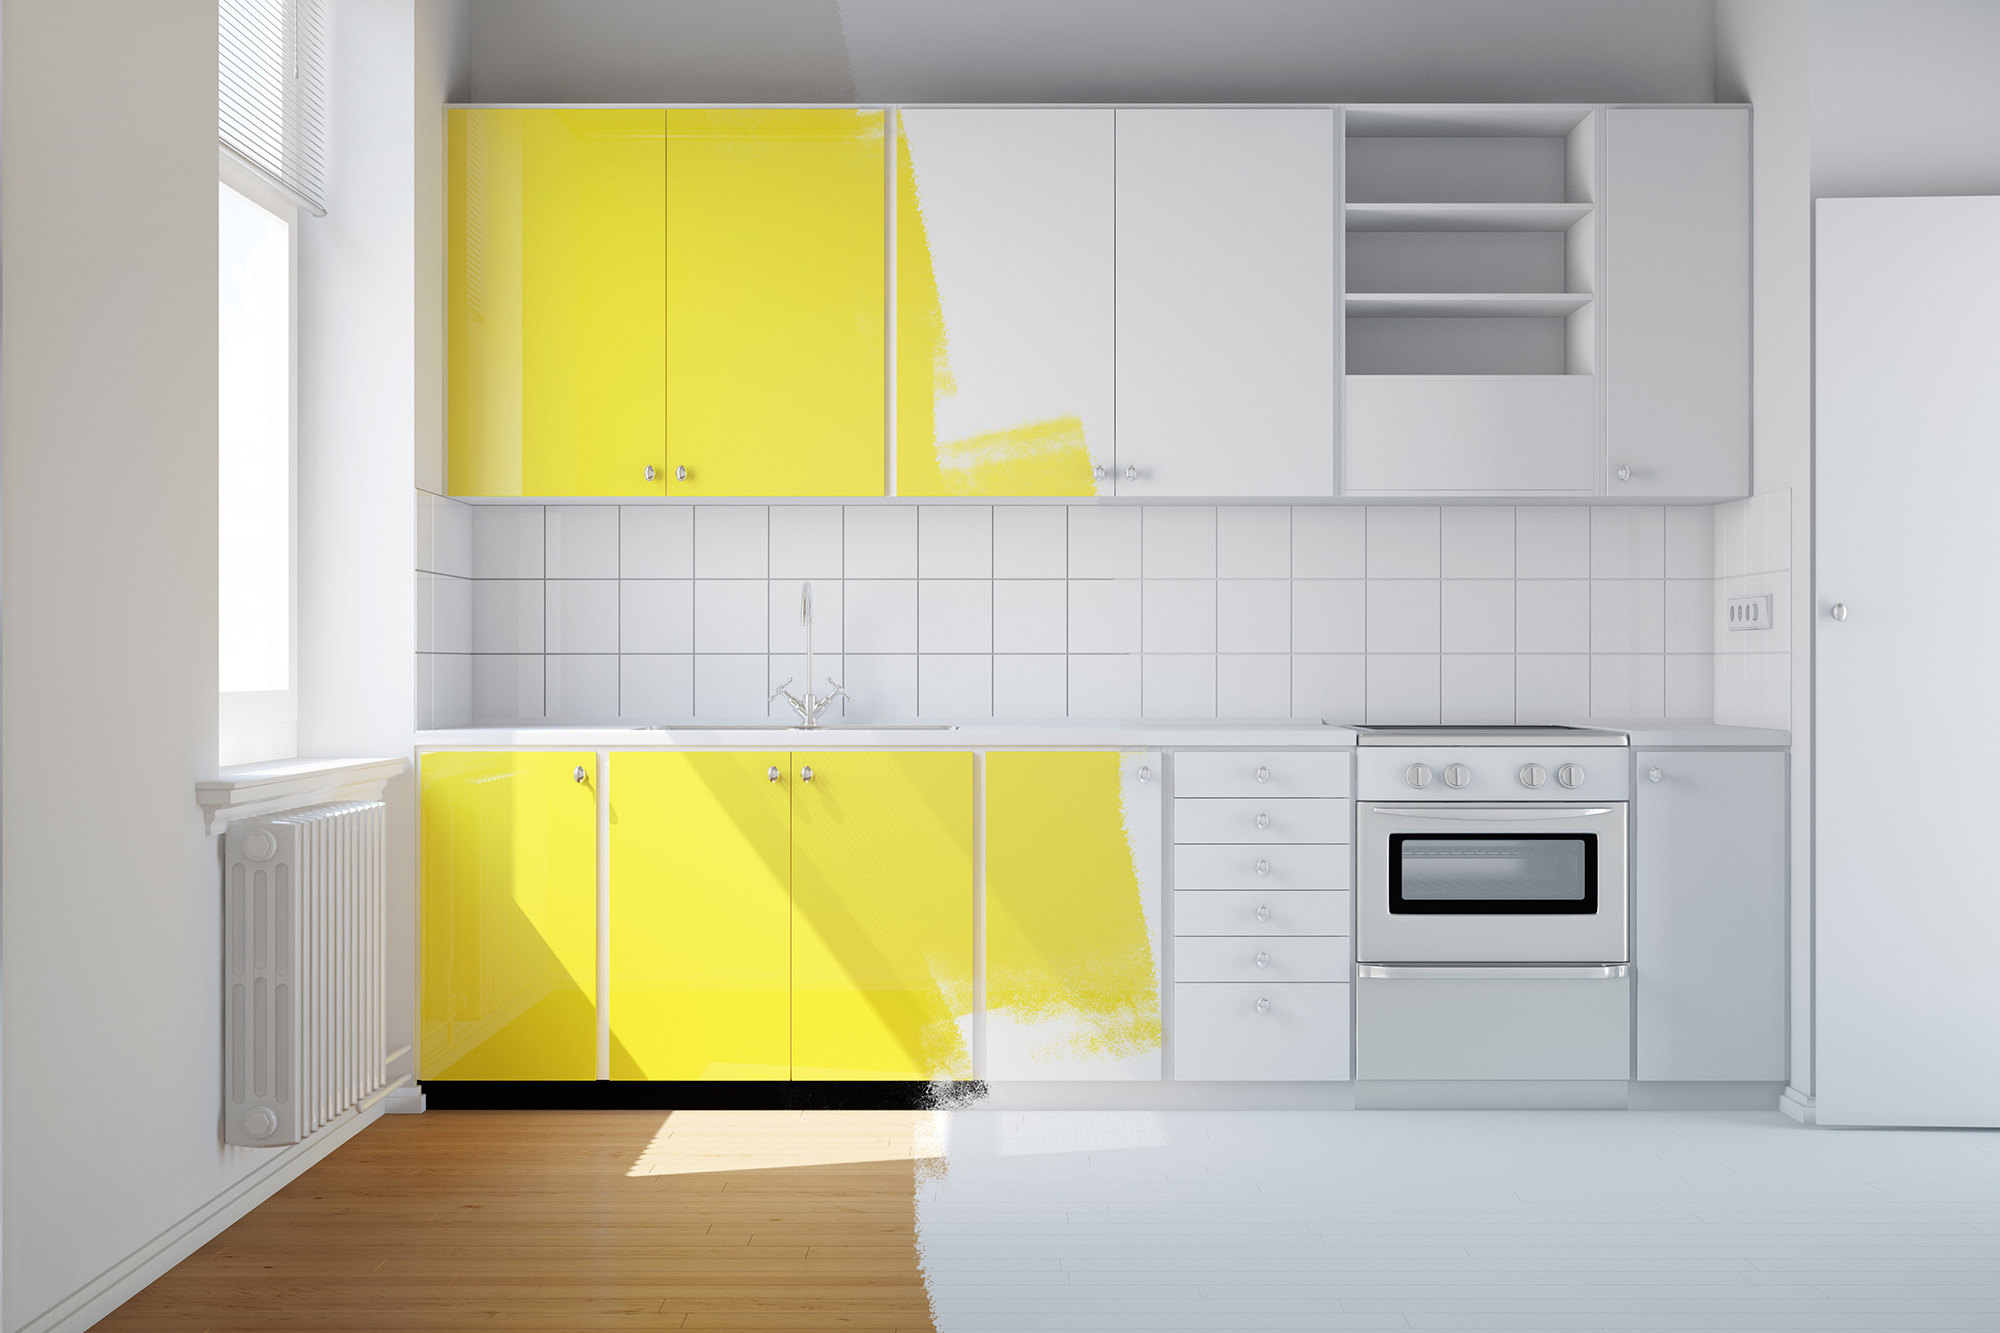 Keuken Kasten Melamine : Keukenkasten schilderen tips polar paintshop gent